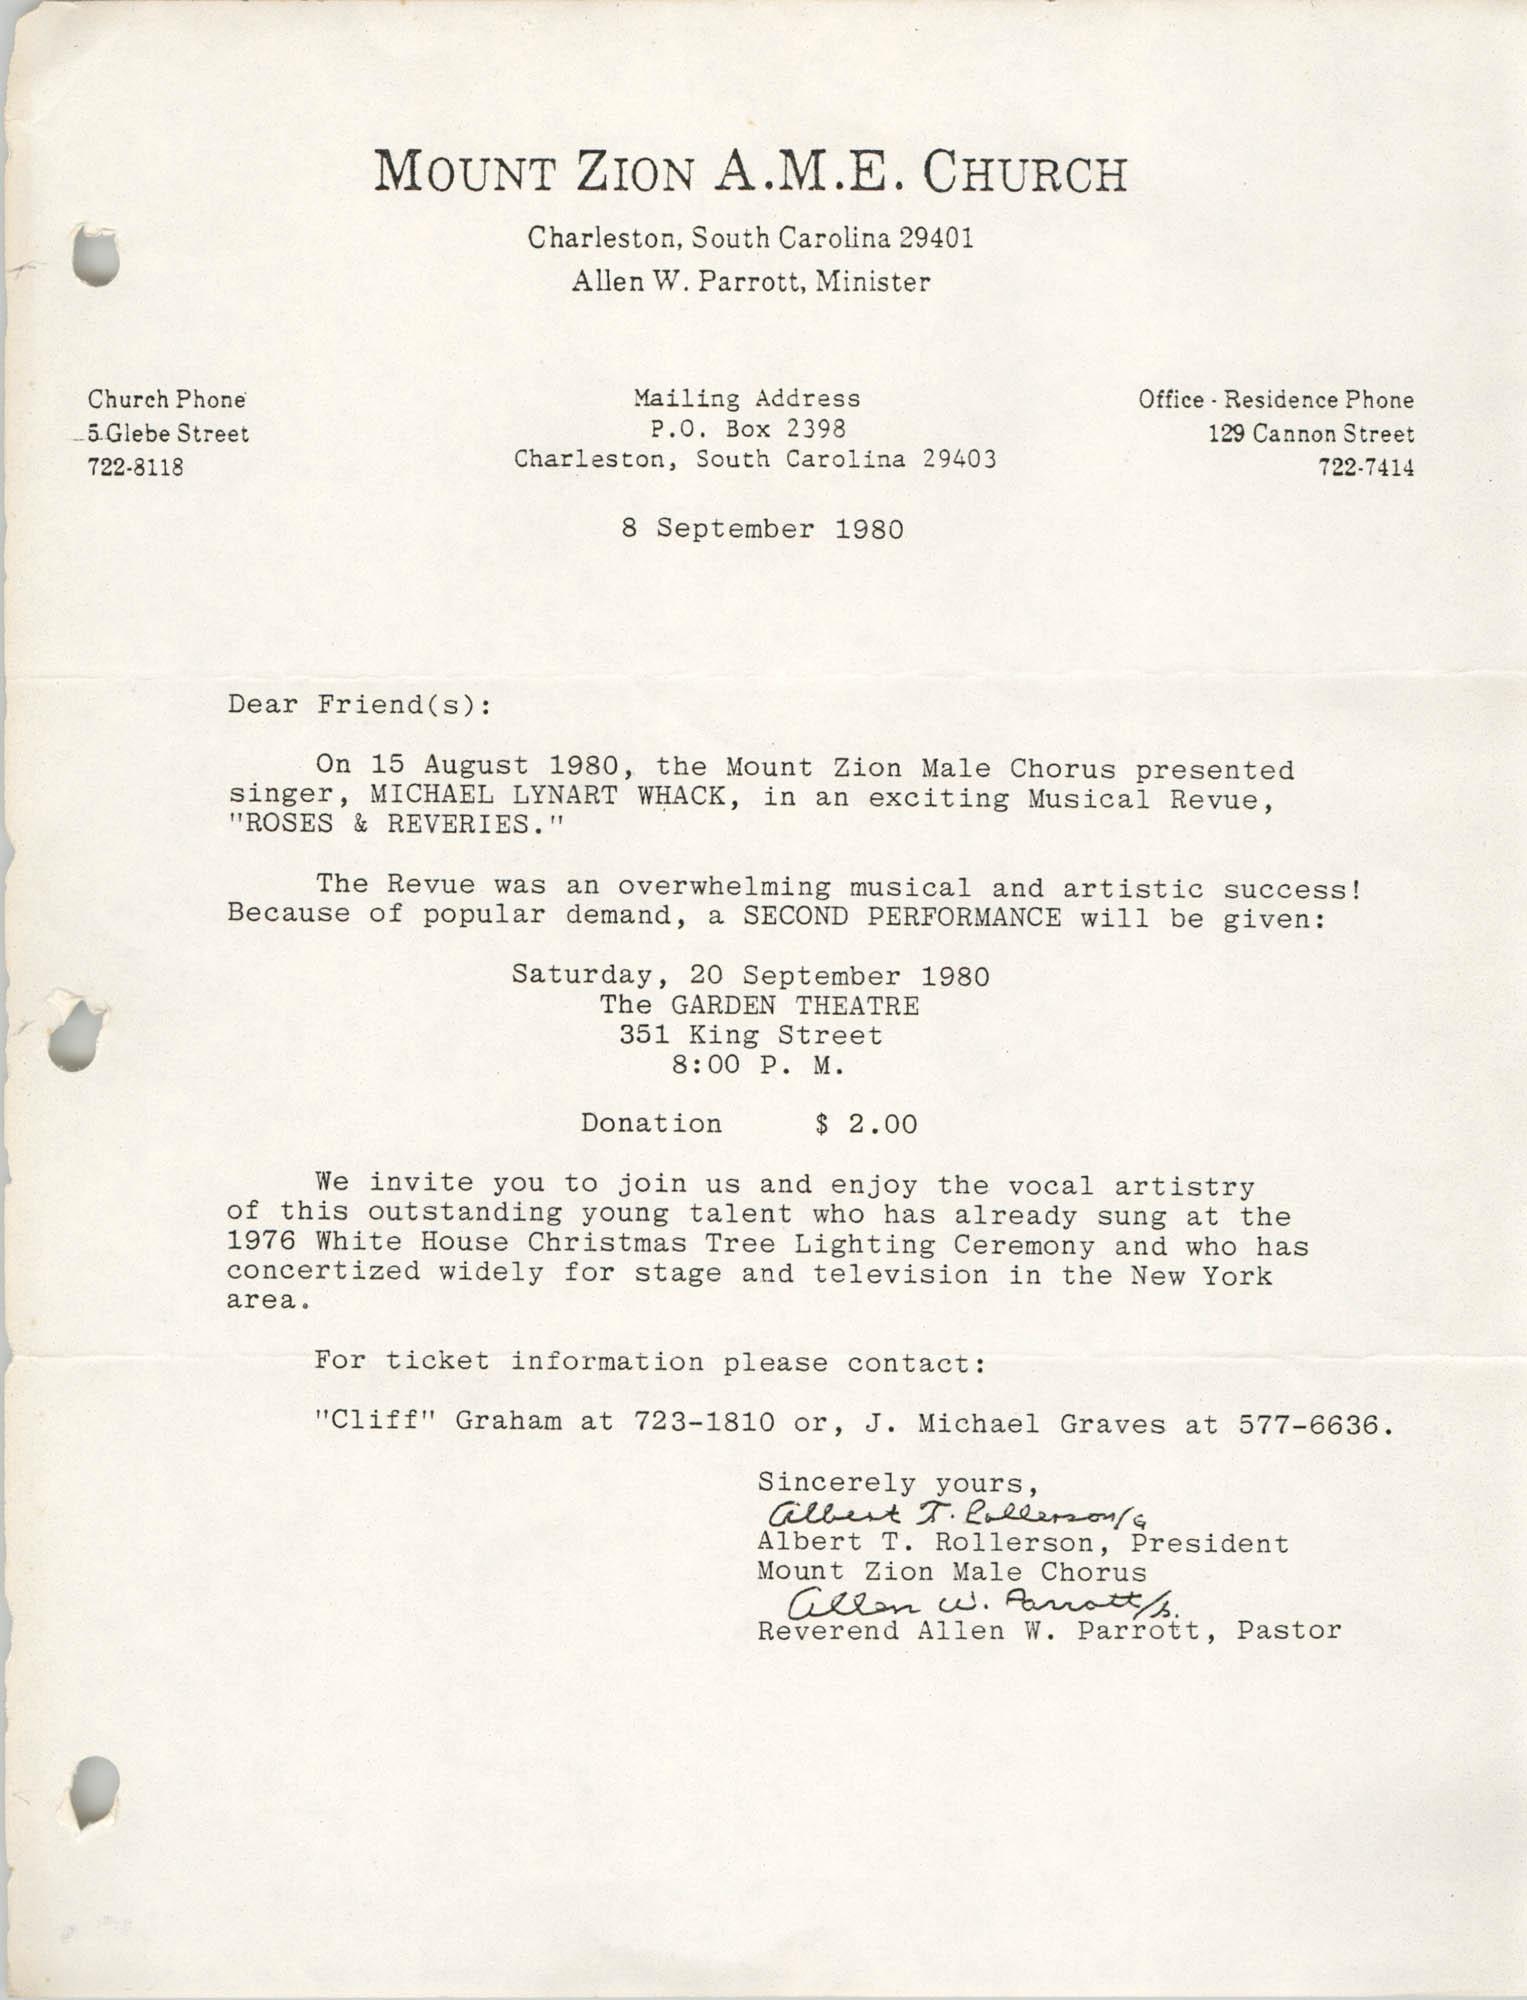 Letter from Albert T. Rollerson and Allen W. Parrott, September 8, 1980